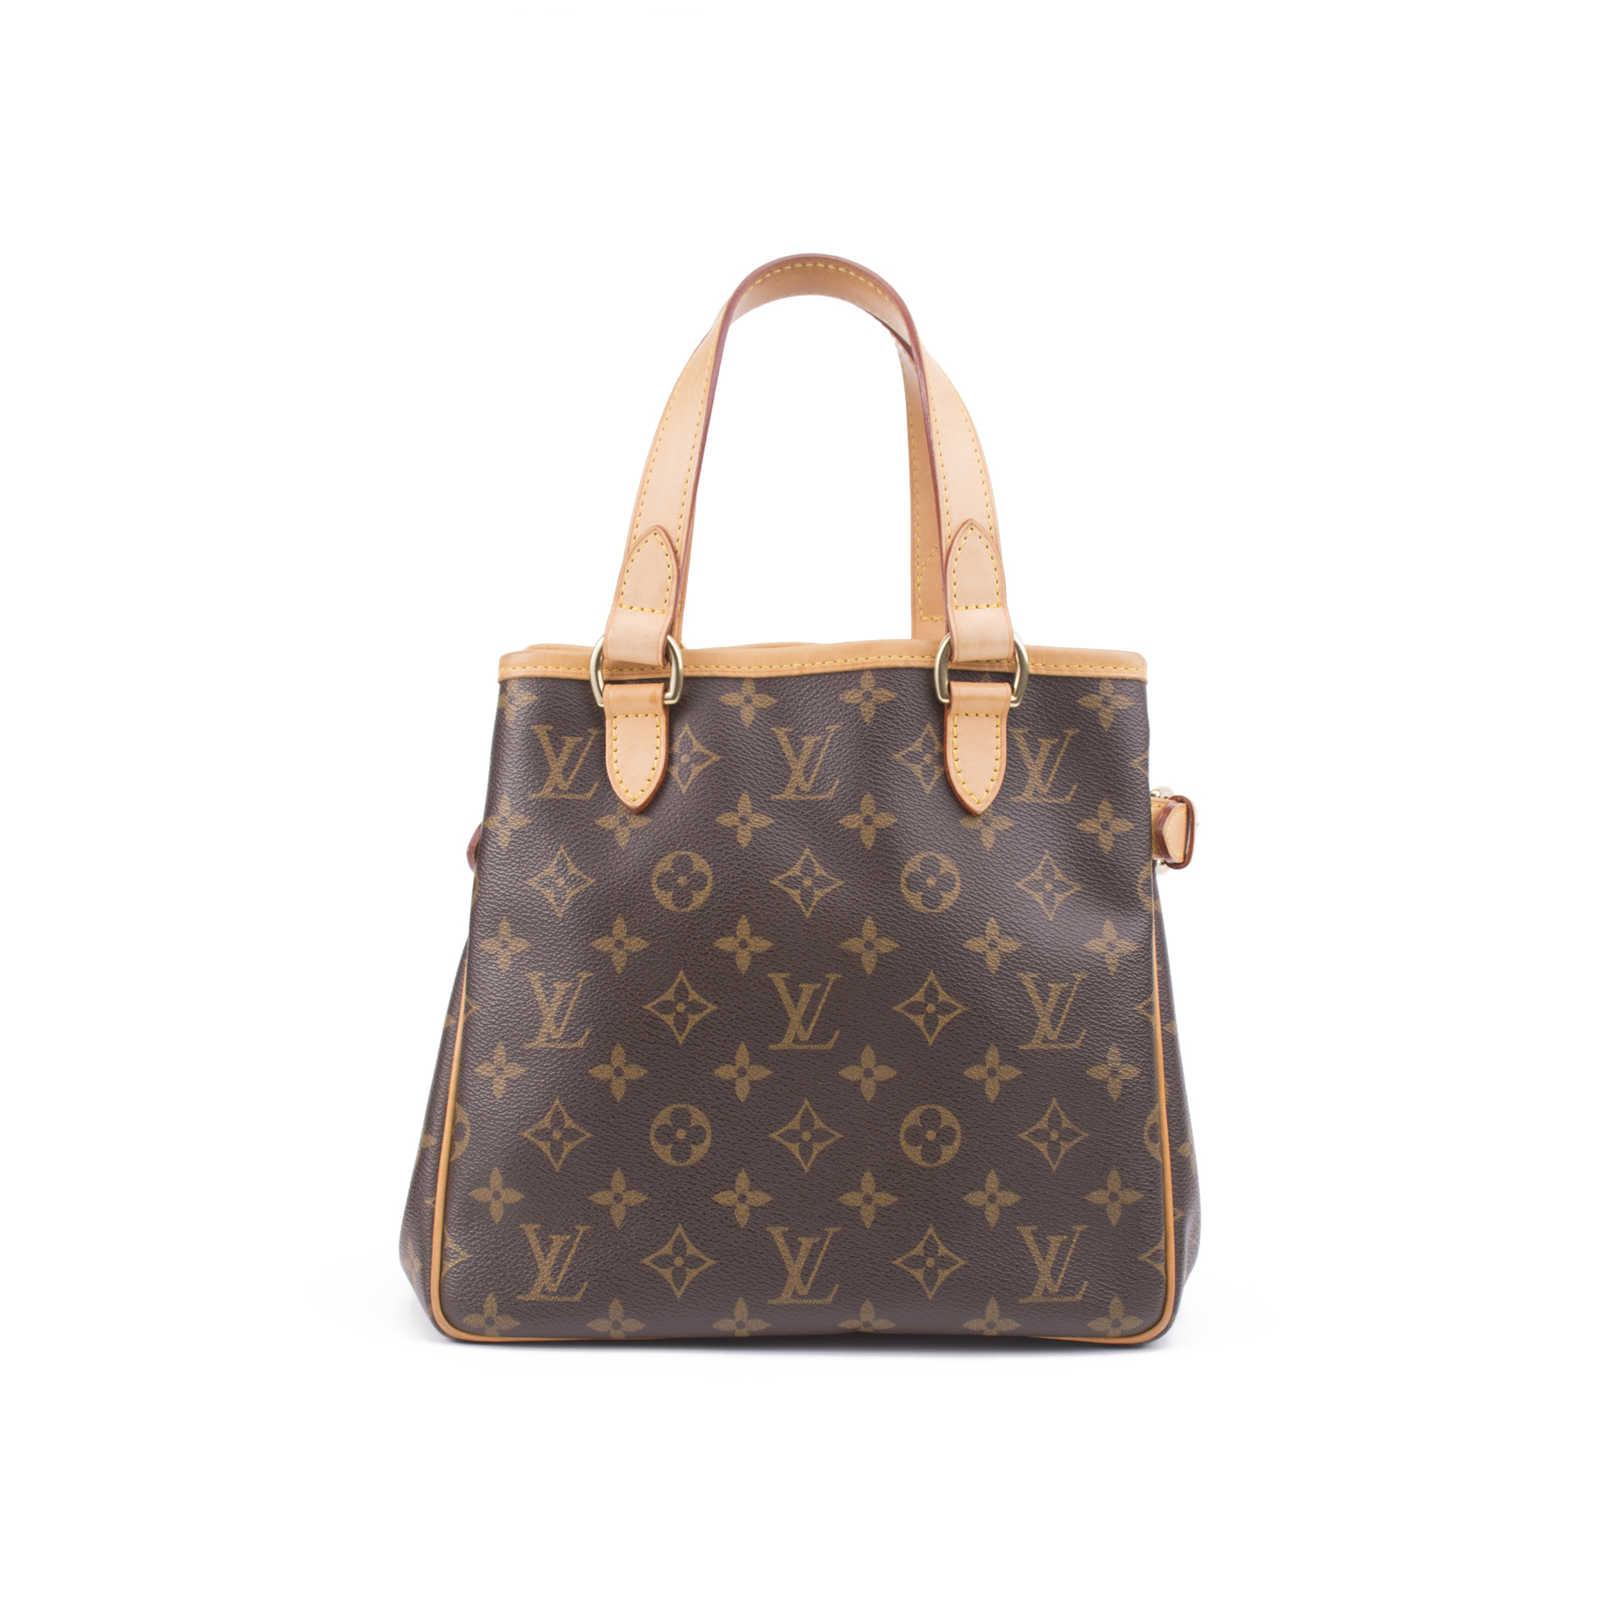 364397a75bf6 Tap to expand · Authentic Second Hand Louis Vuitton Monogram Batignolles  Bag (PSS-291-00003) ...